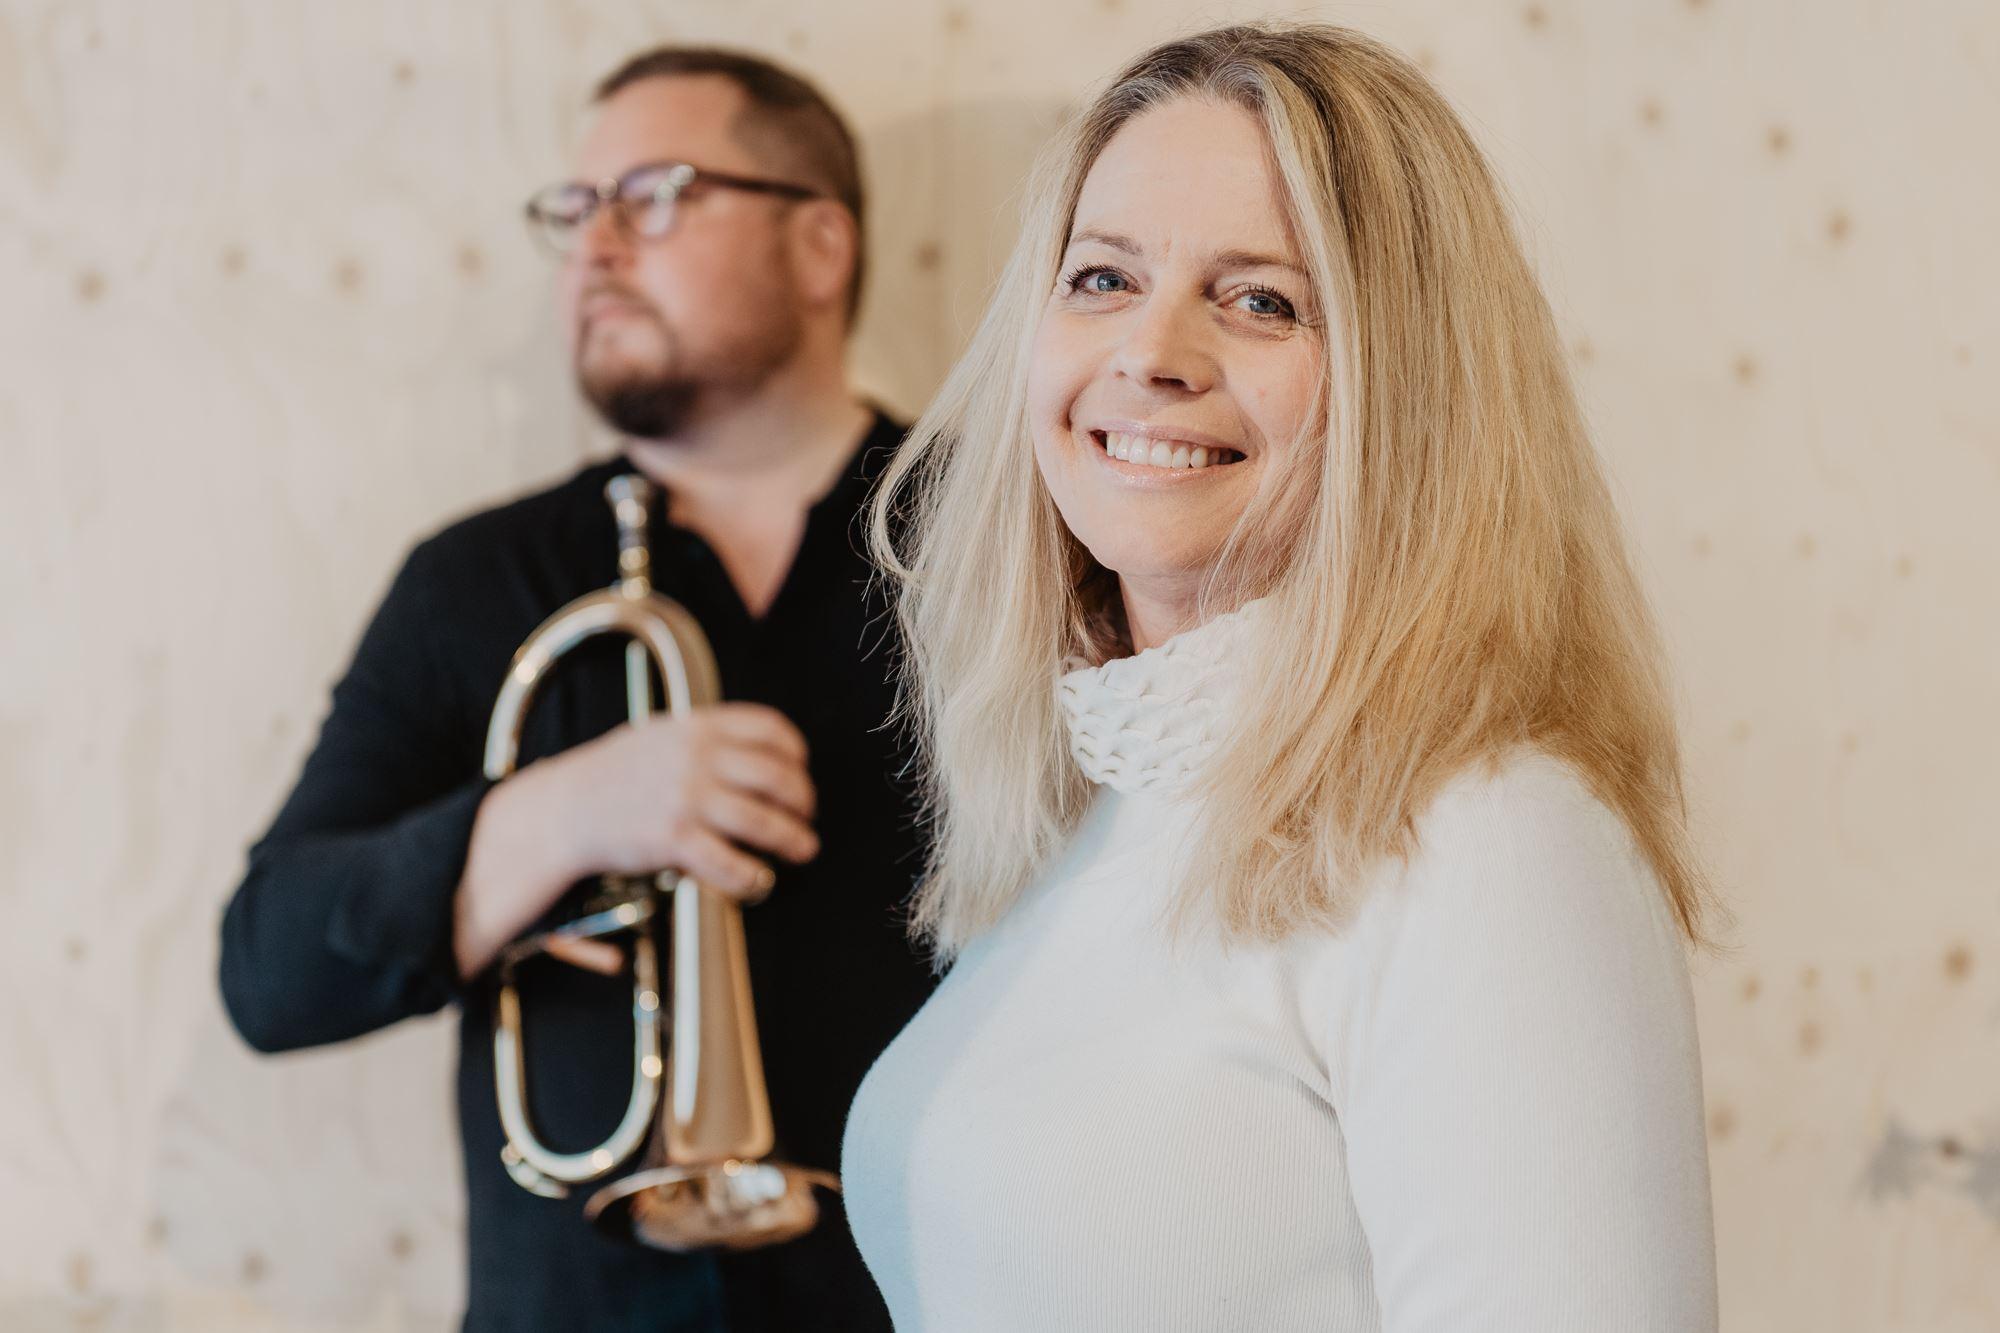 Foto: Marianne Lindgren, Marie Björnsdotter Wretling & Per Wretling